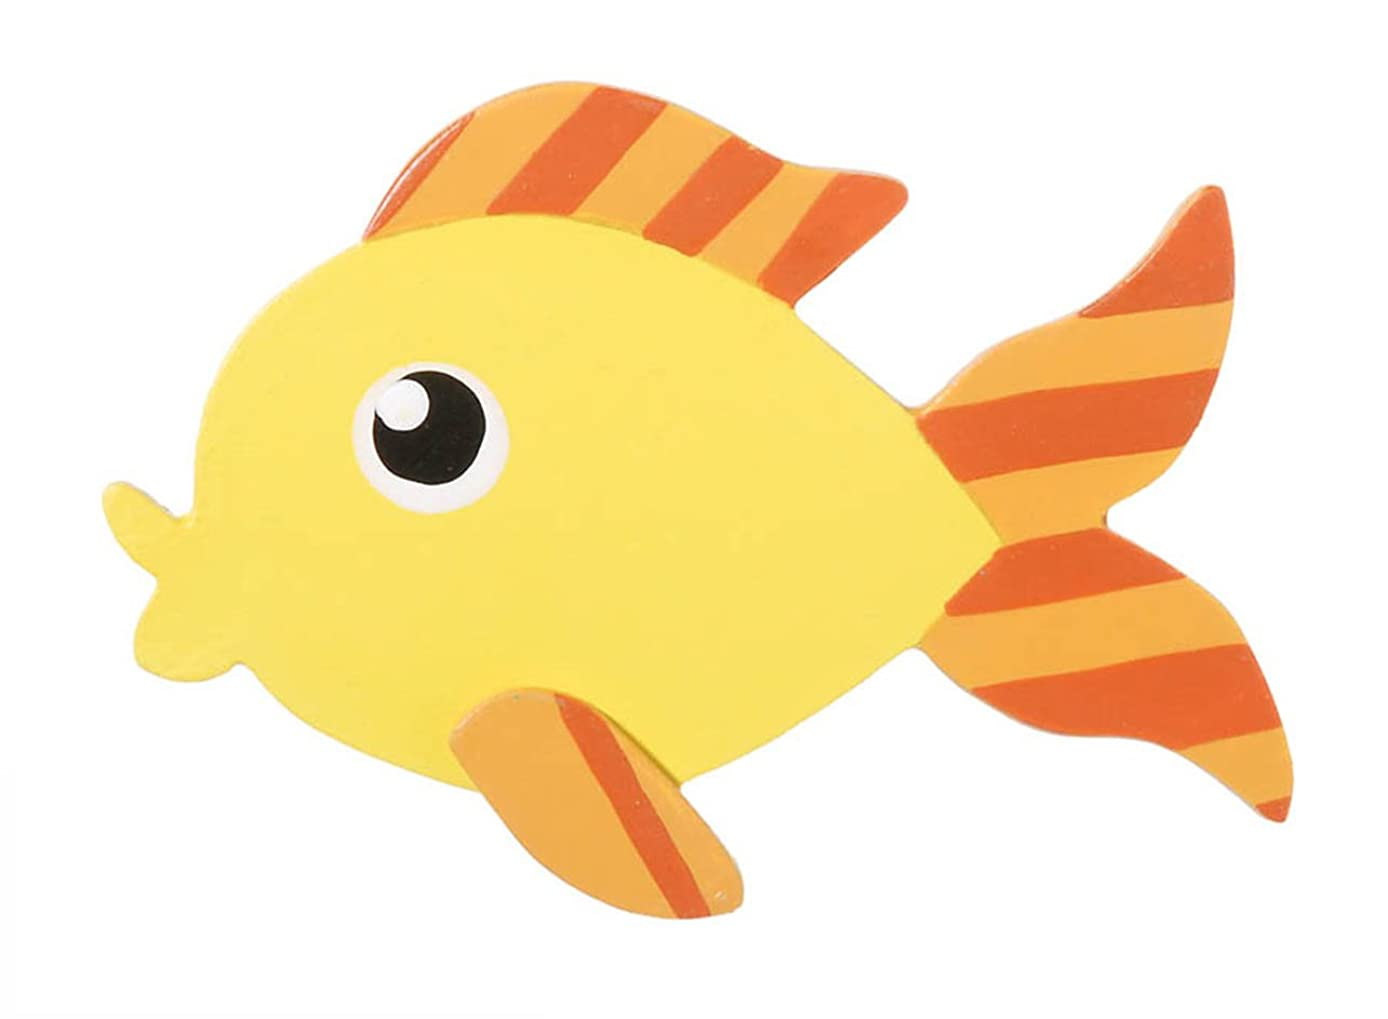 Darice 9189-67 Painted Friendly Fish Shape Cutout